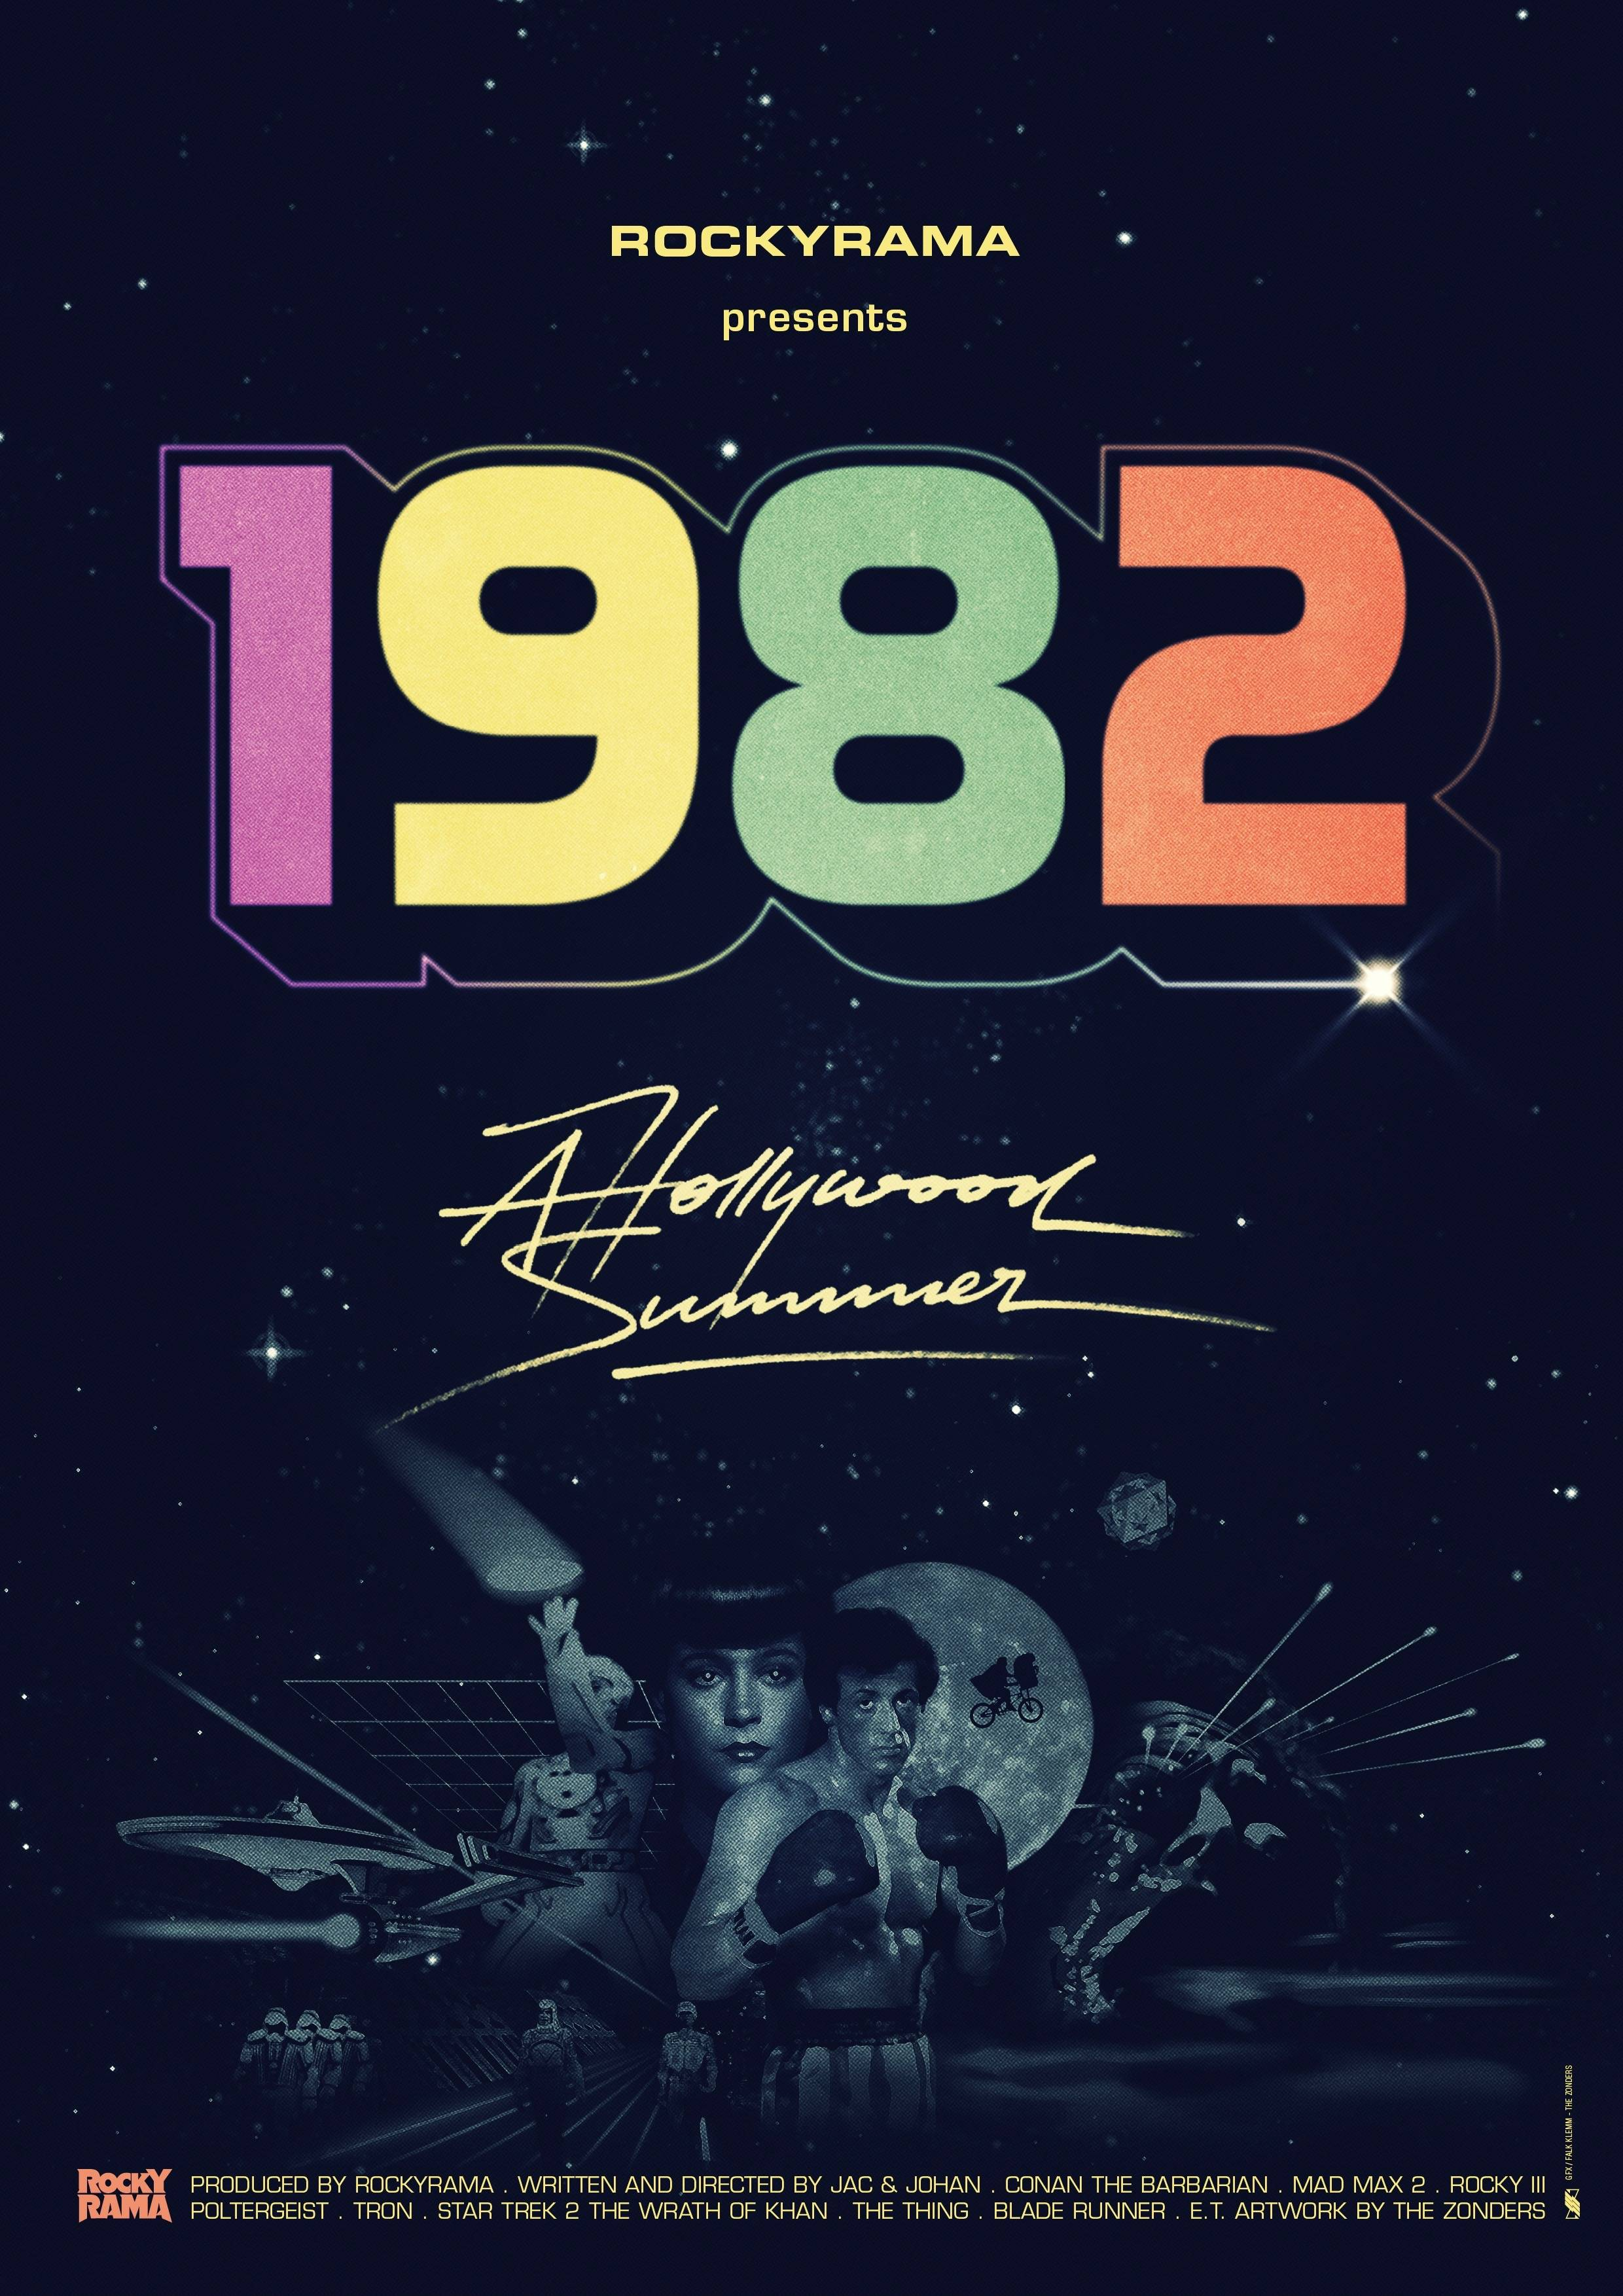 lete-1982-a-hollywood-un-documentaire-rockyrama-a-soutenir-sur-kiss-kiss-bank-bank